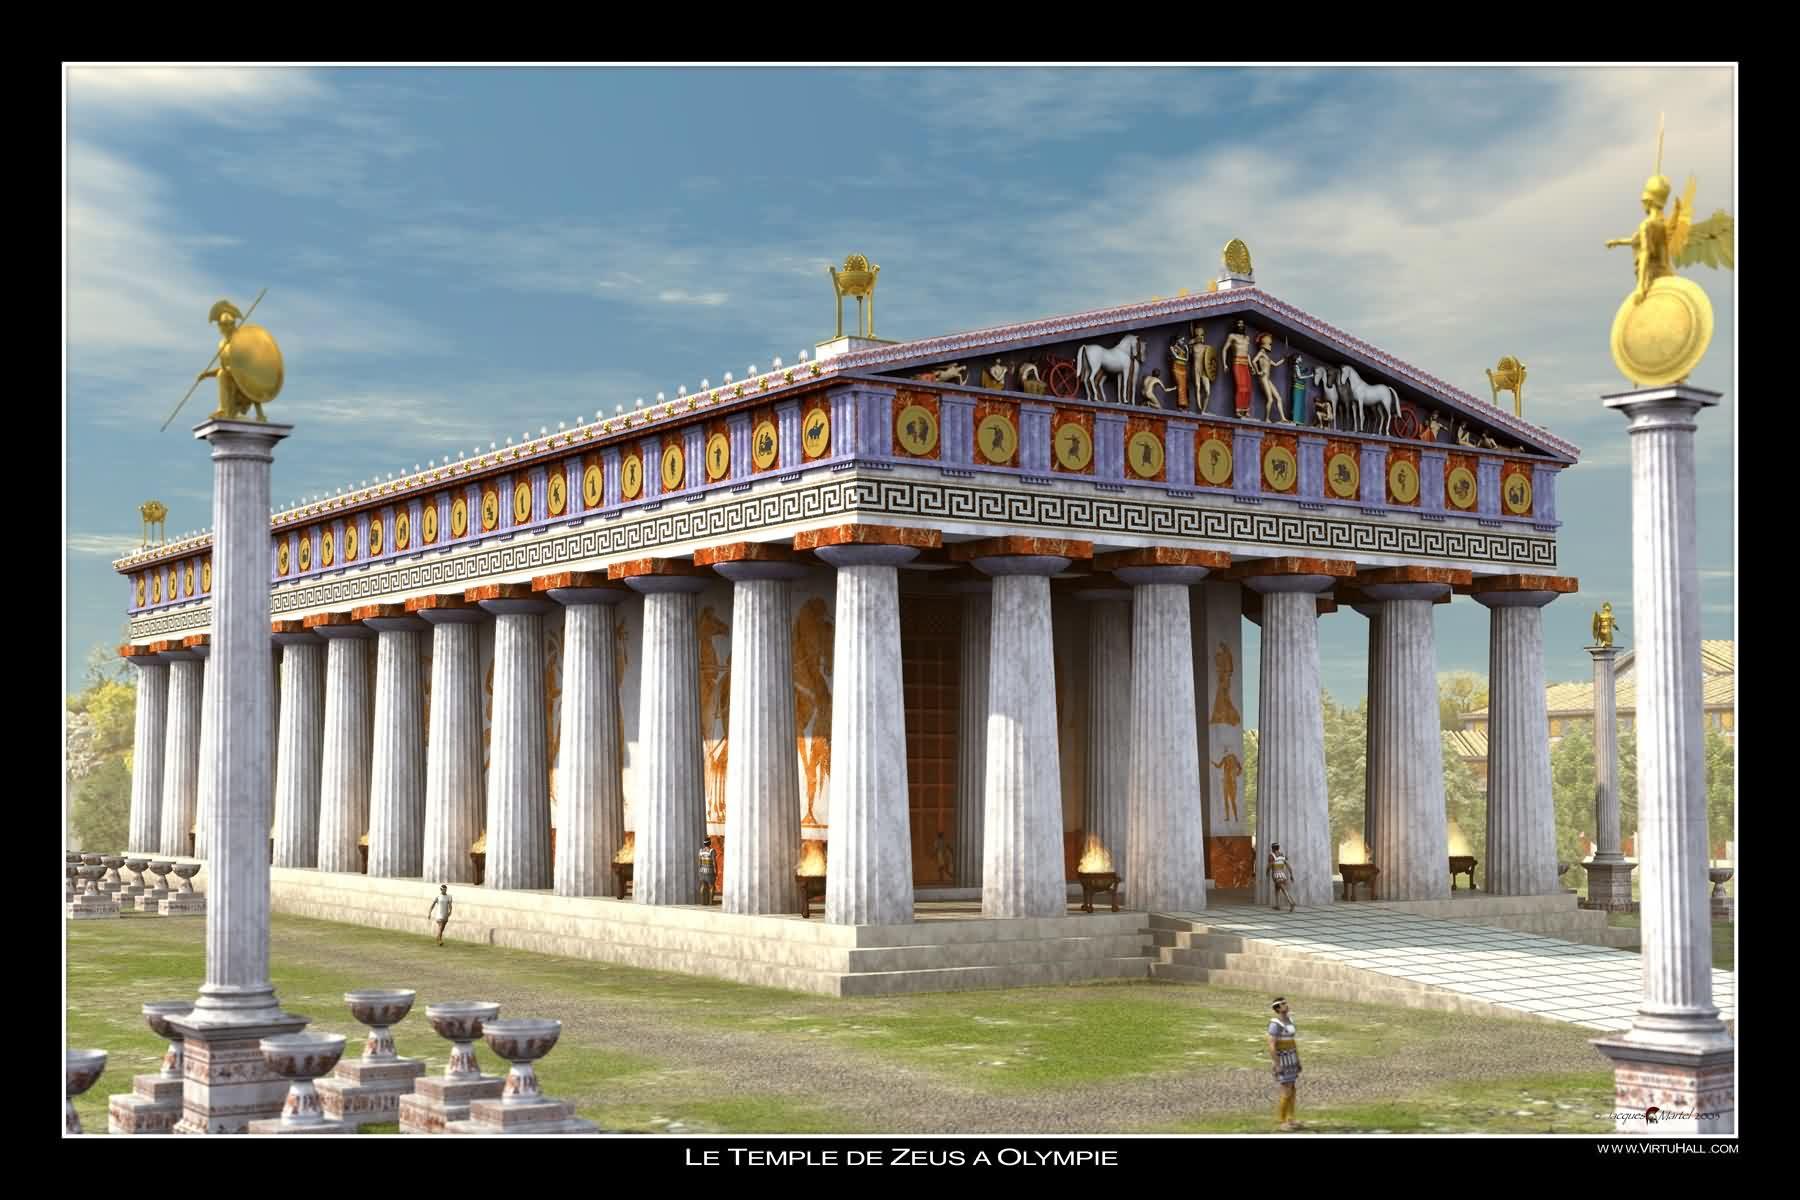 Ies otero pedrayo de ourense for Architecture grecque